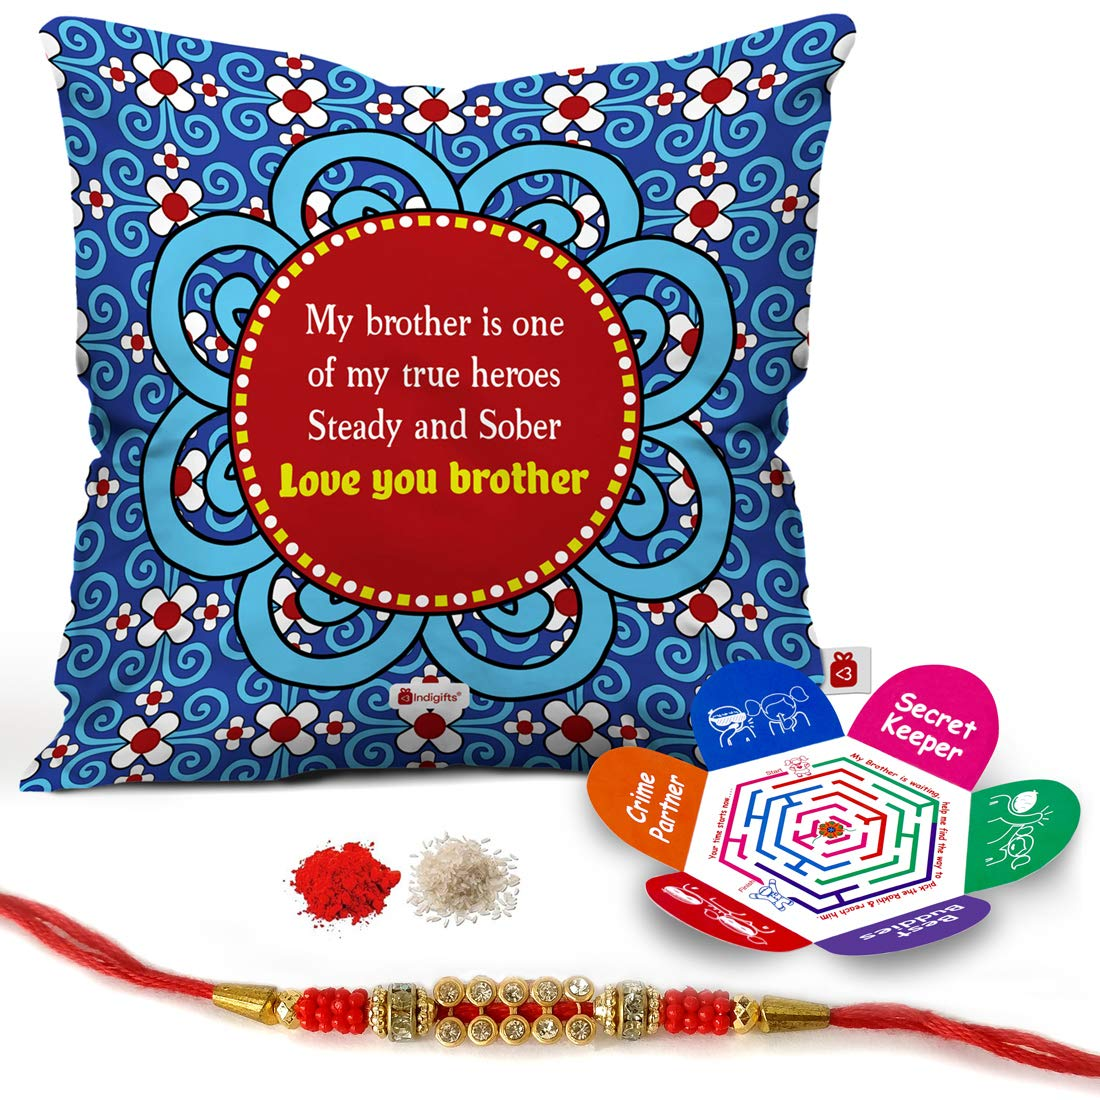 Buy Indi ts Raksha Bandhan Gifts for Brother Set of Love You Bro